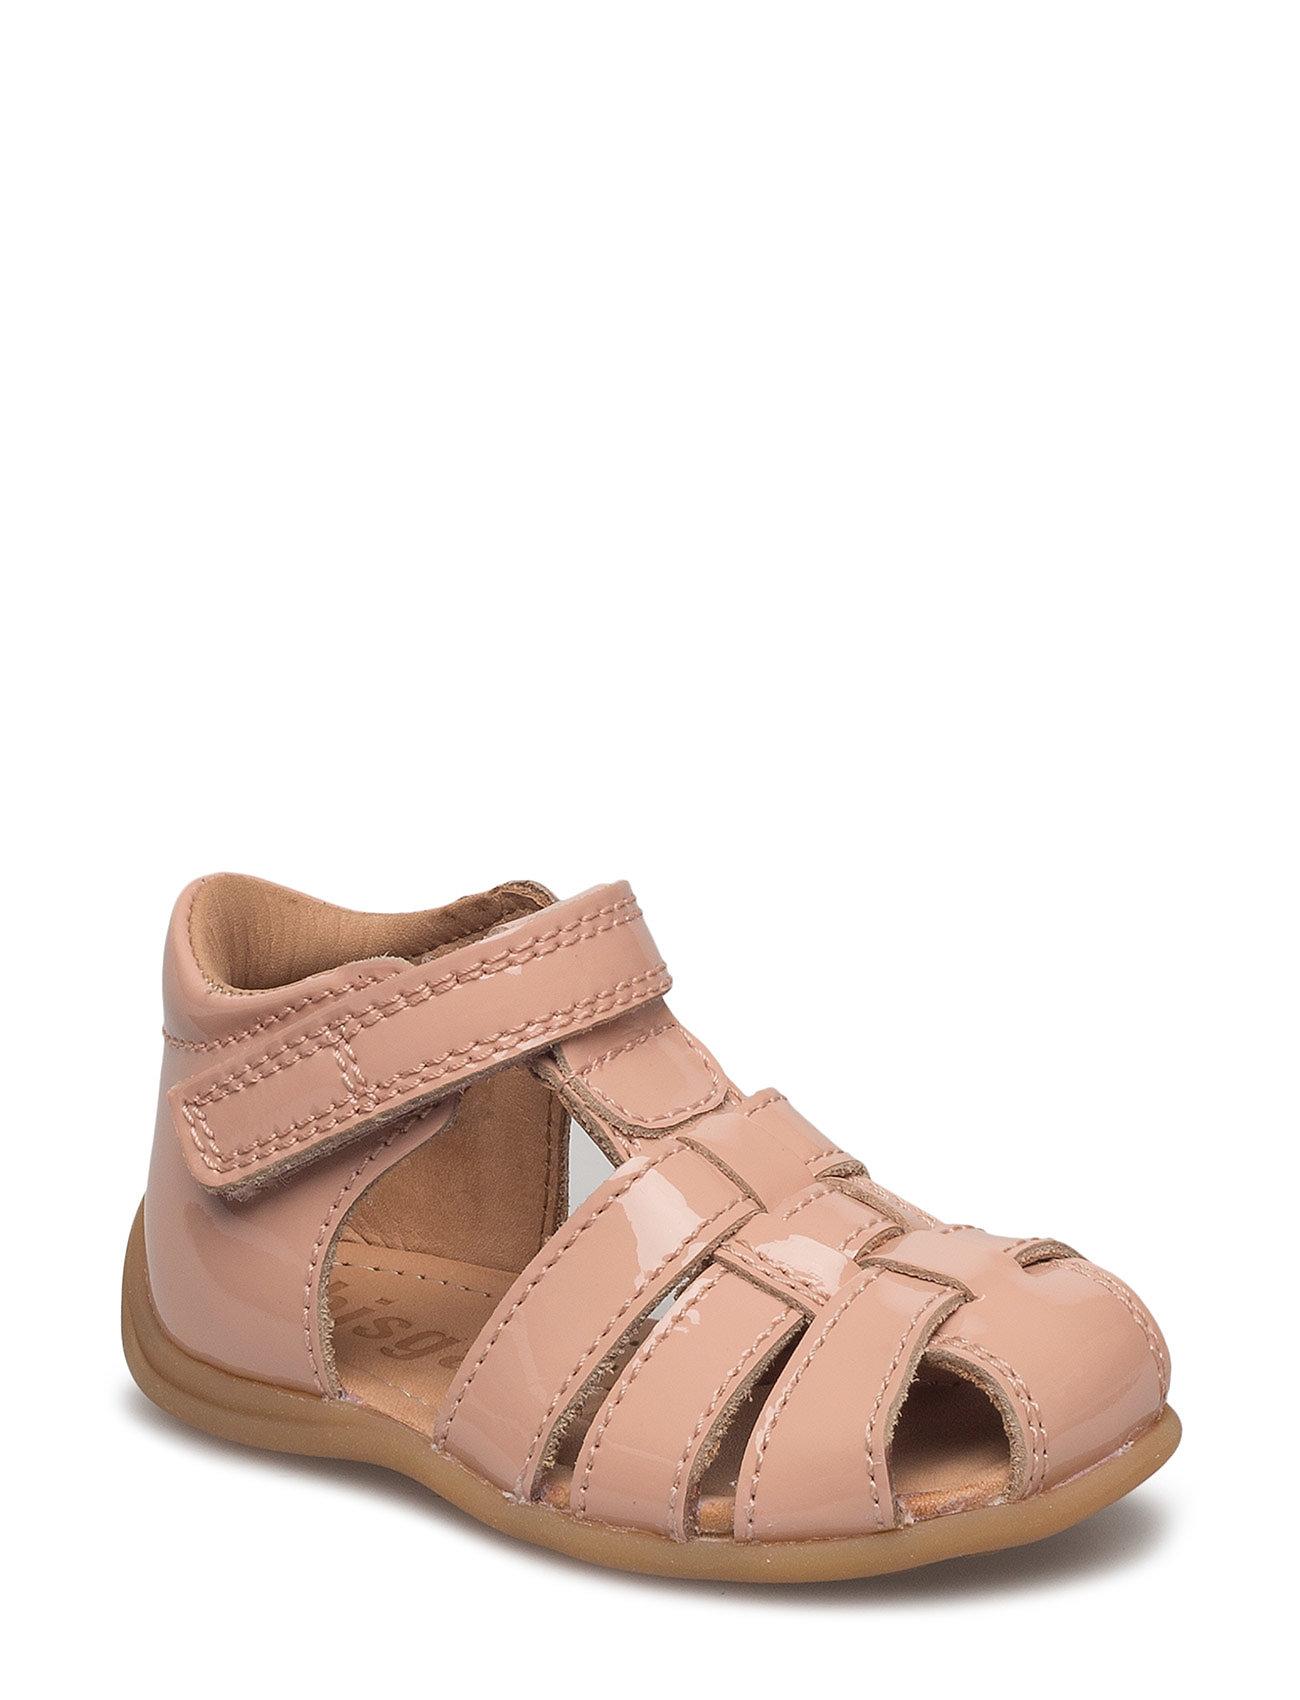 Bisgaard Sandals